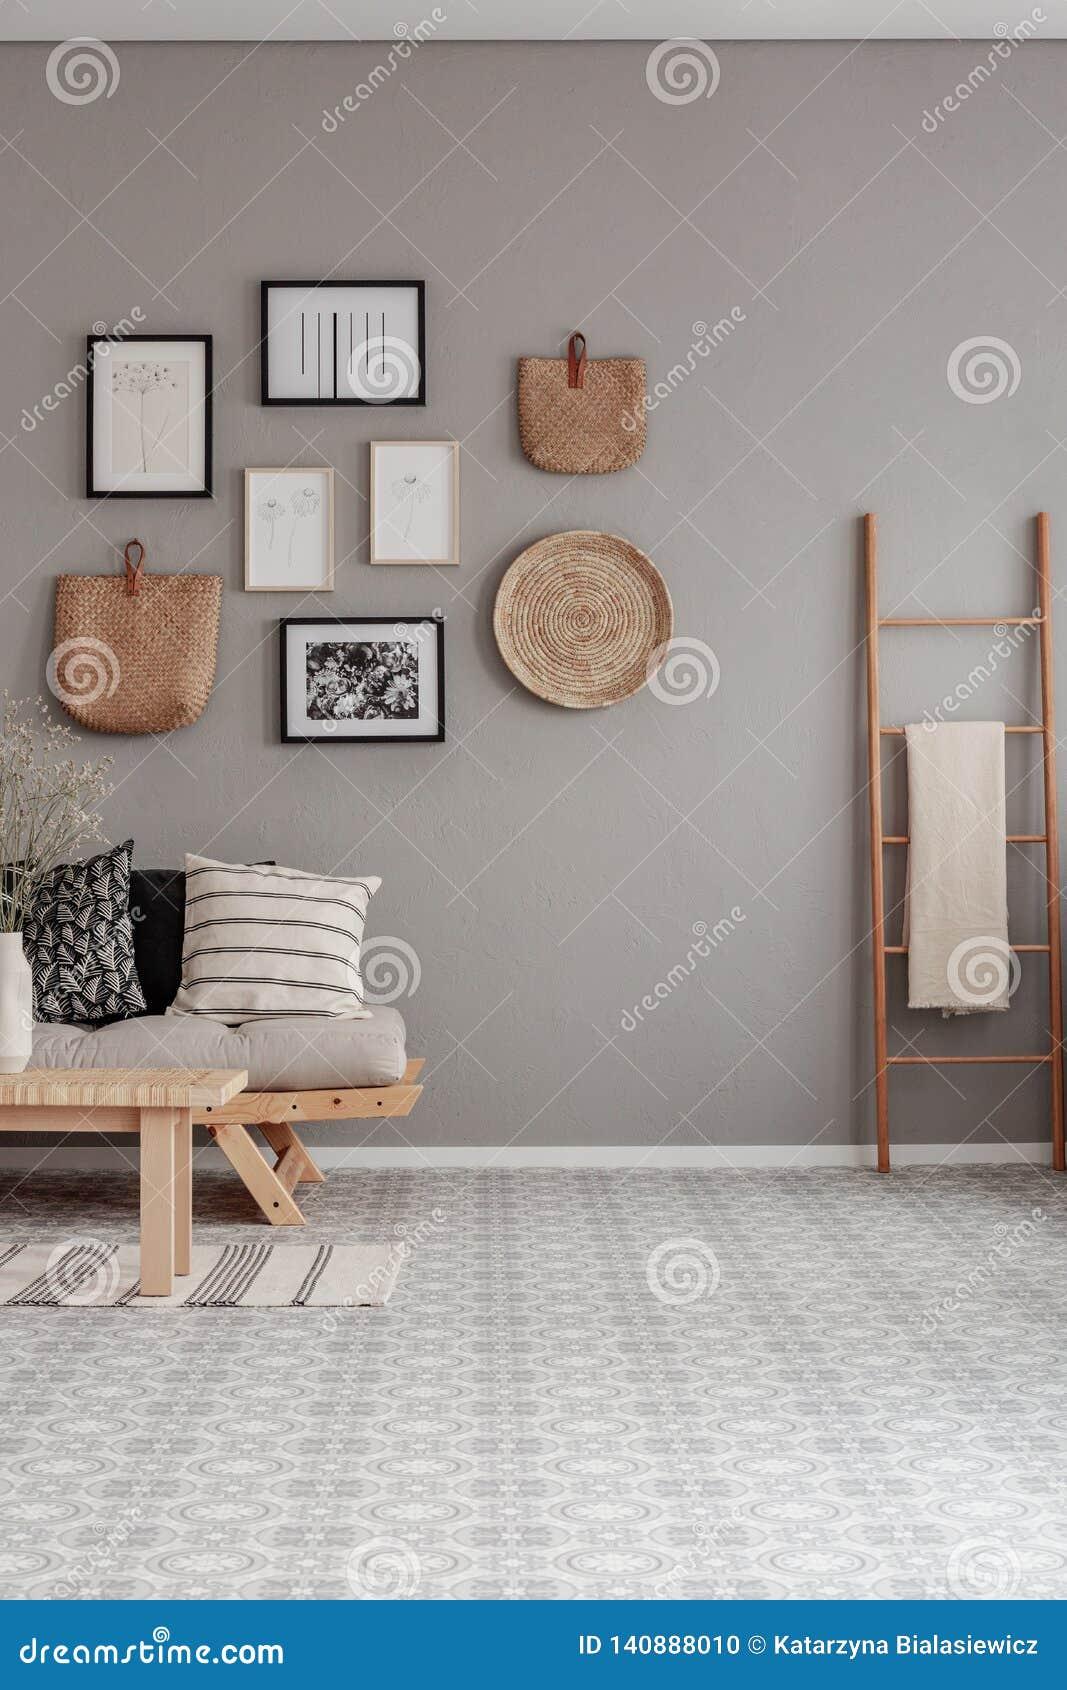 Verticale mening van mooi woonkamerbinnenland met houten ladder met deken